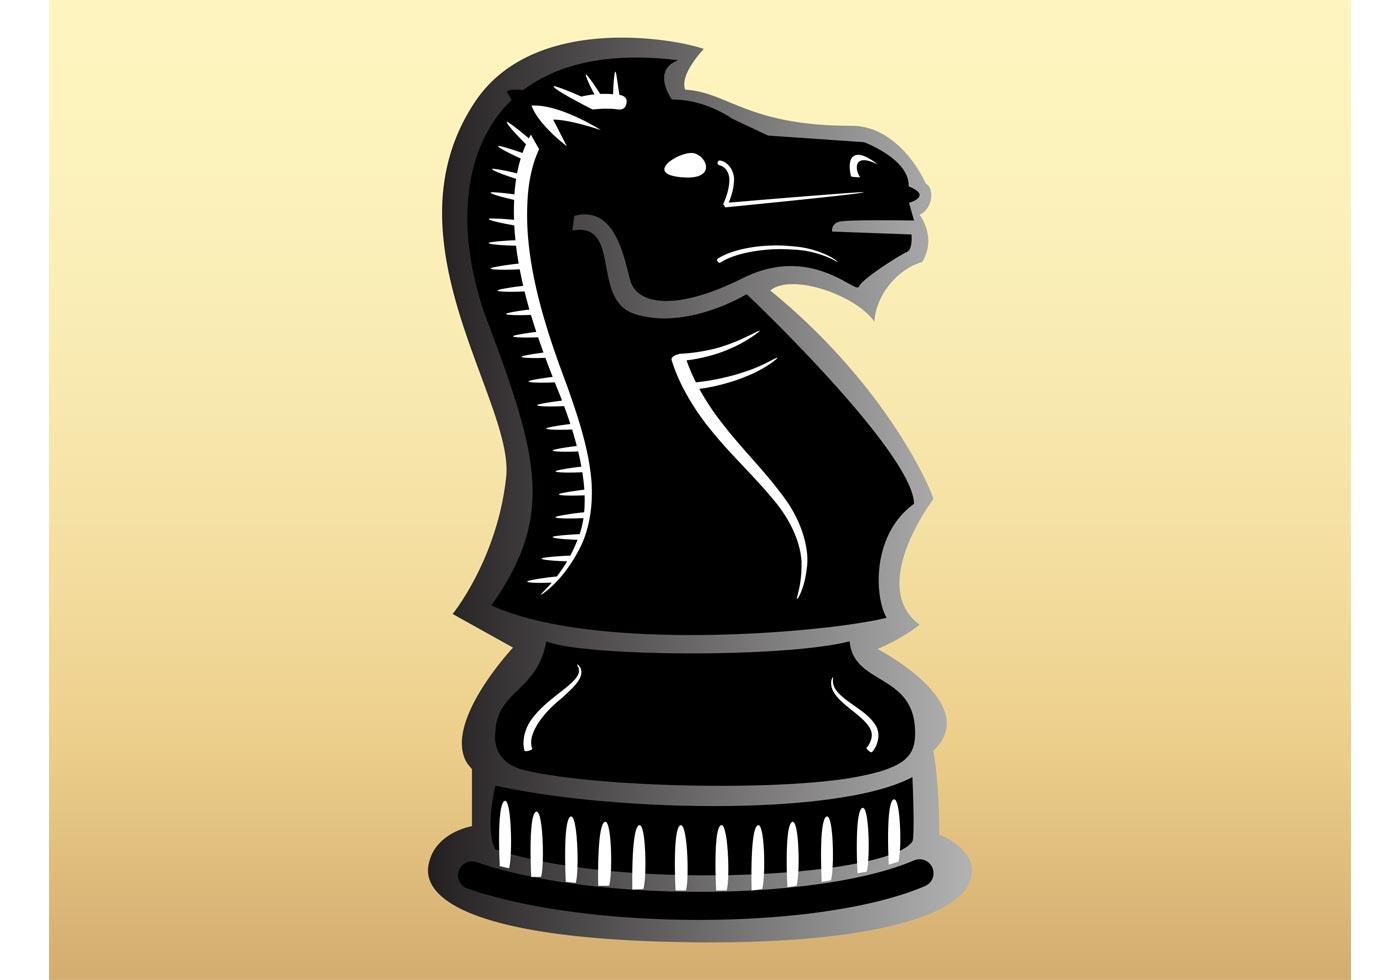 Knight Chess Piece Free Vector Art 780 Free Downloads